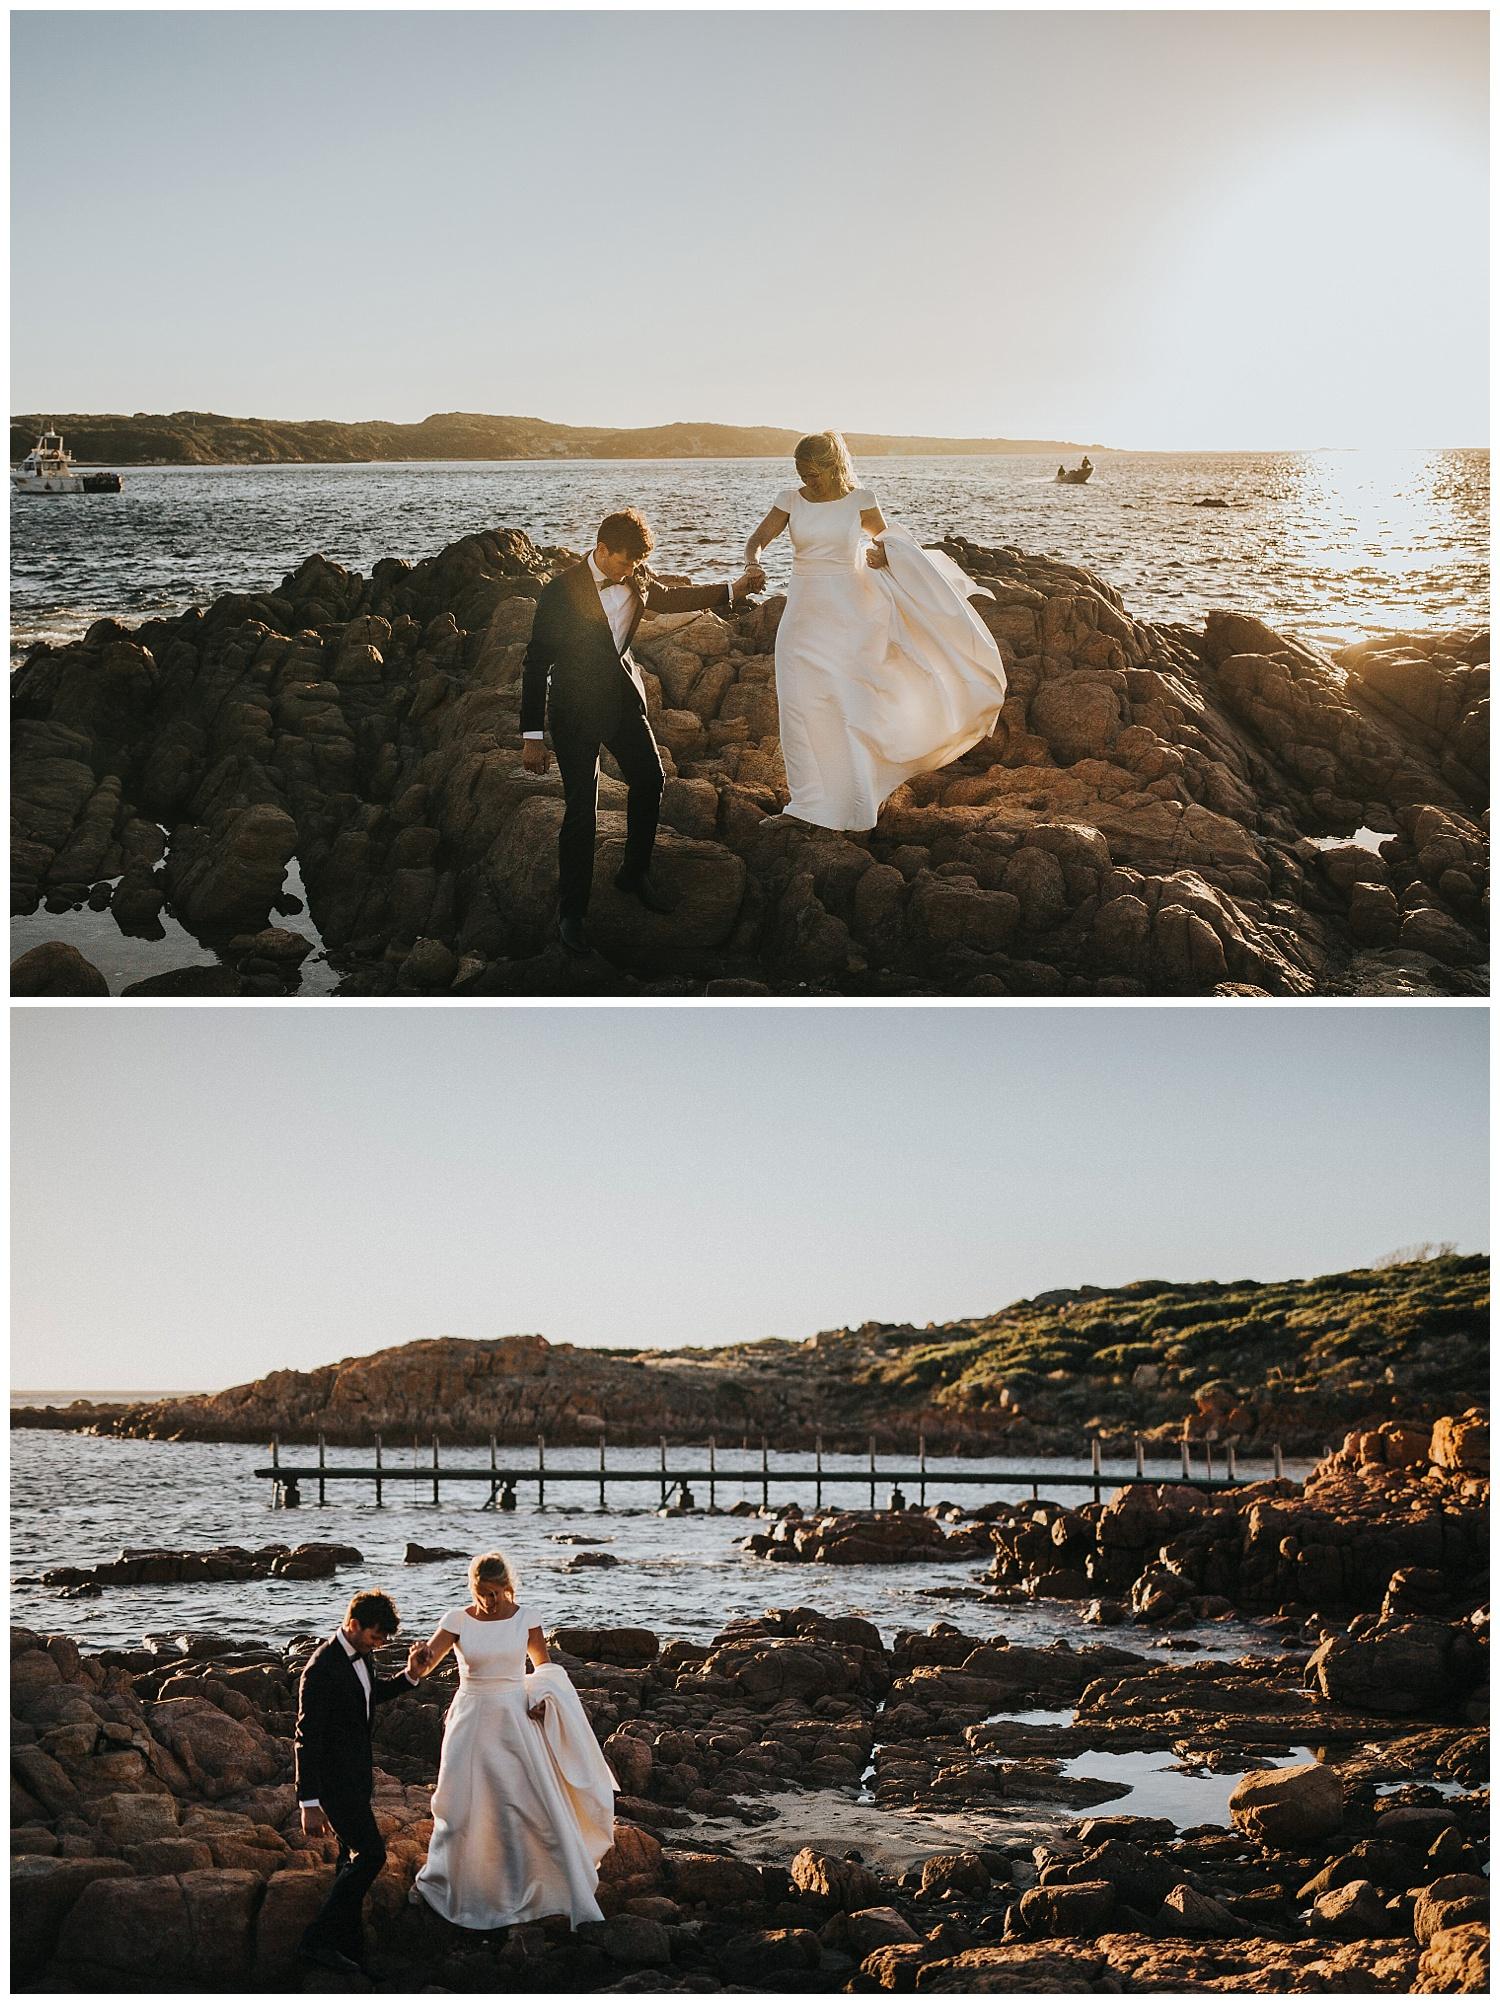 olio_bello_wedding_keeper_creative_031.JPG